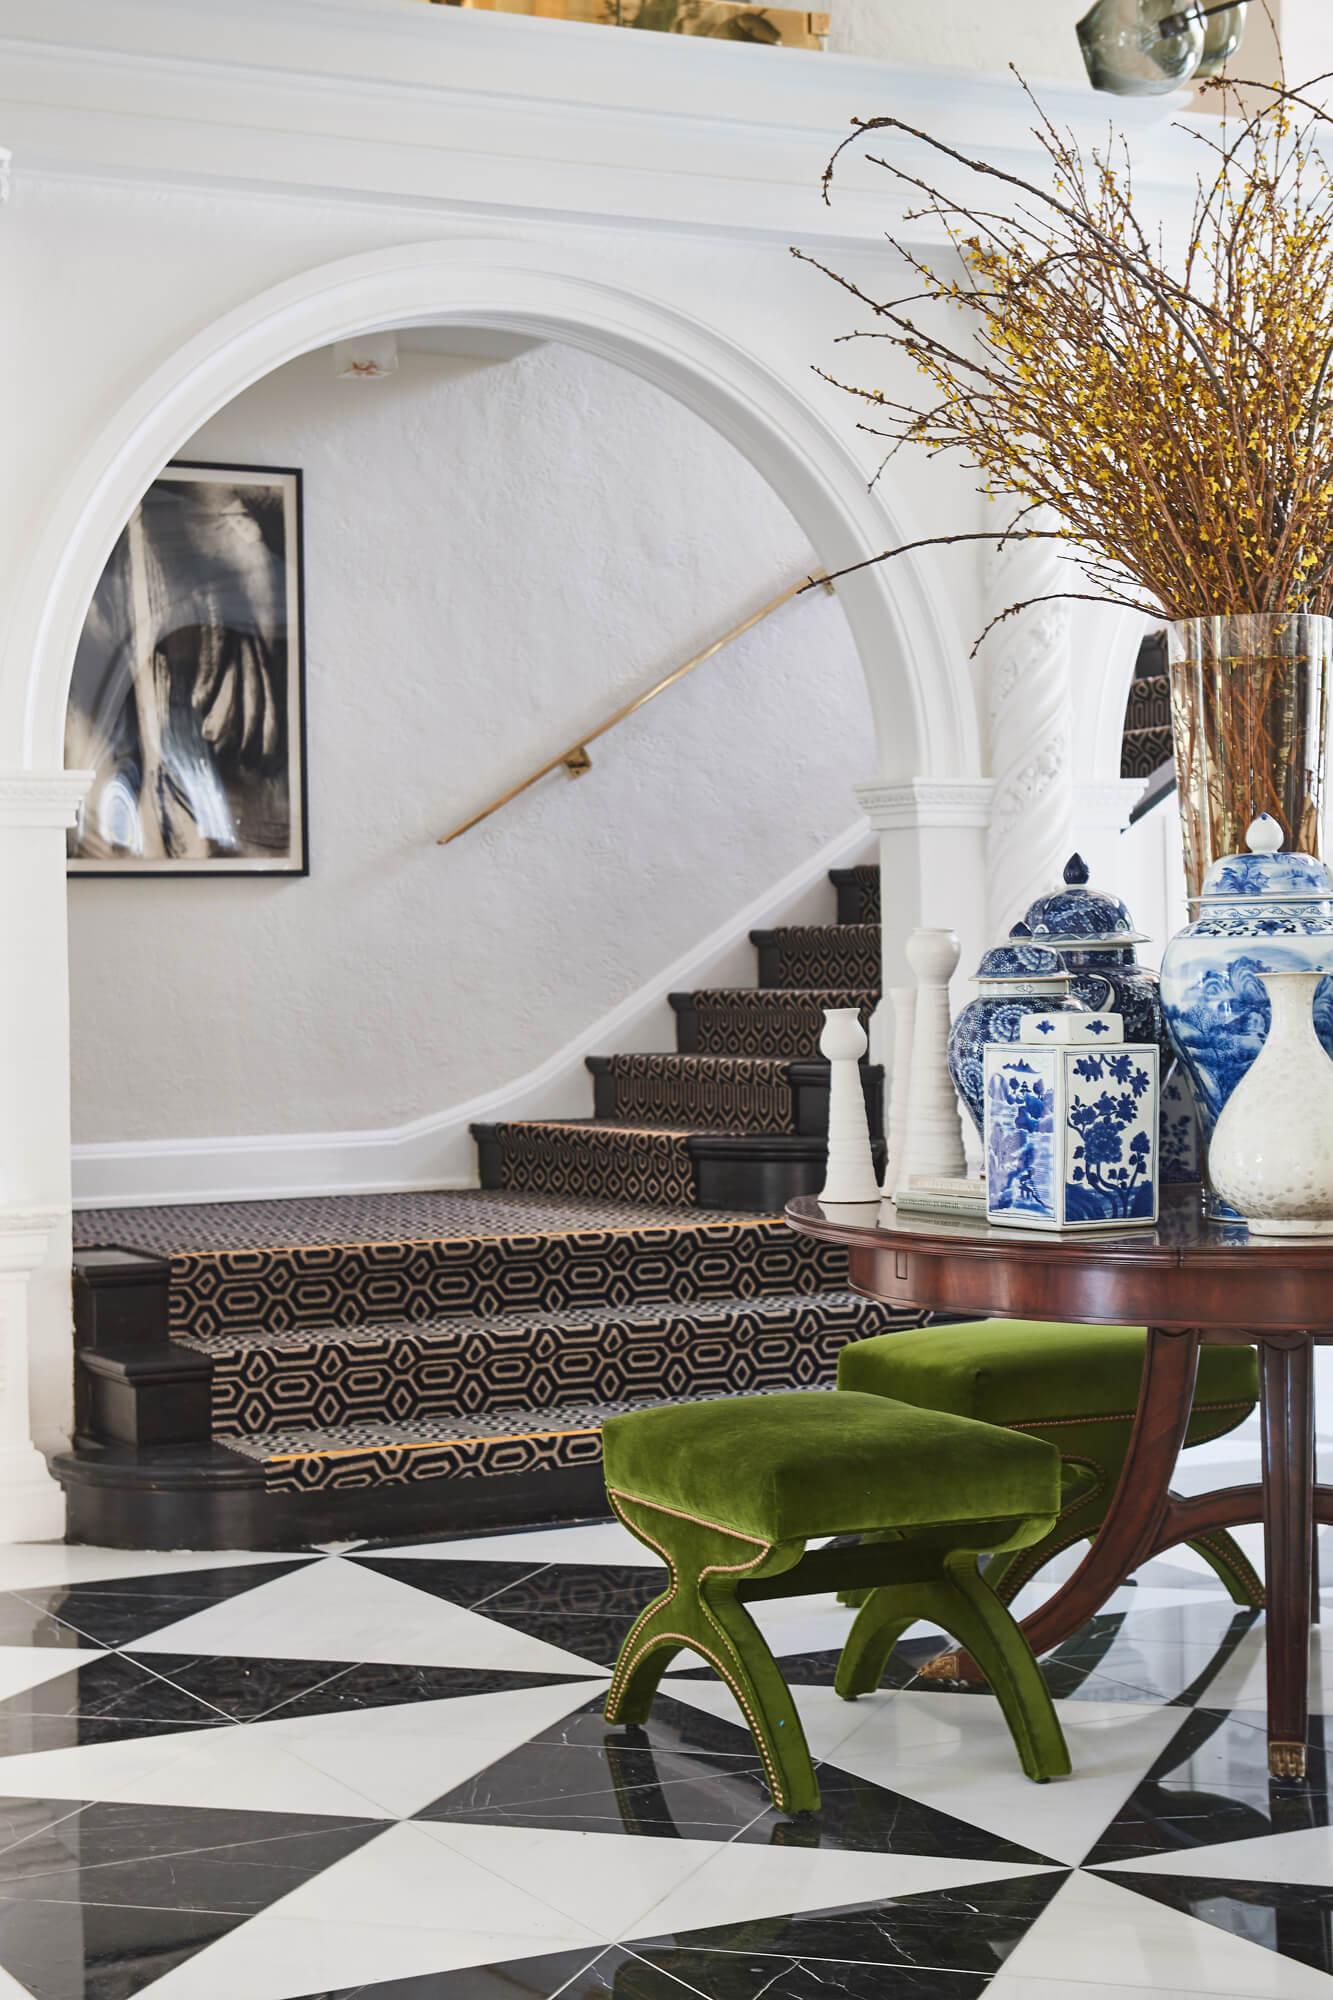 Pasadena Showcase House of Design Entry Hall - Designer: Amy Peltier, Photographer: Peter Christiansen Valli #foyer #entryhall